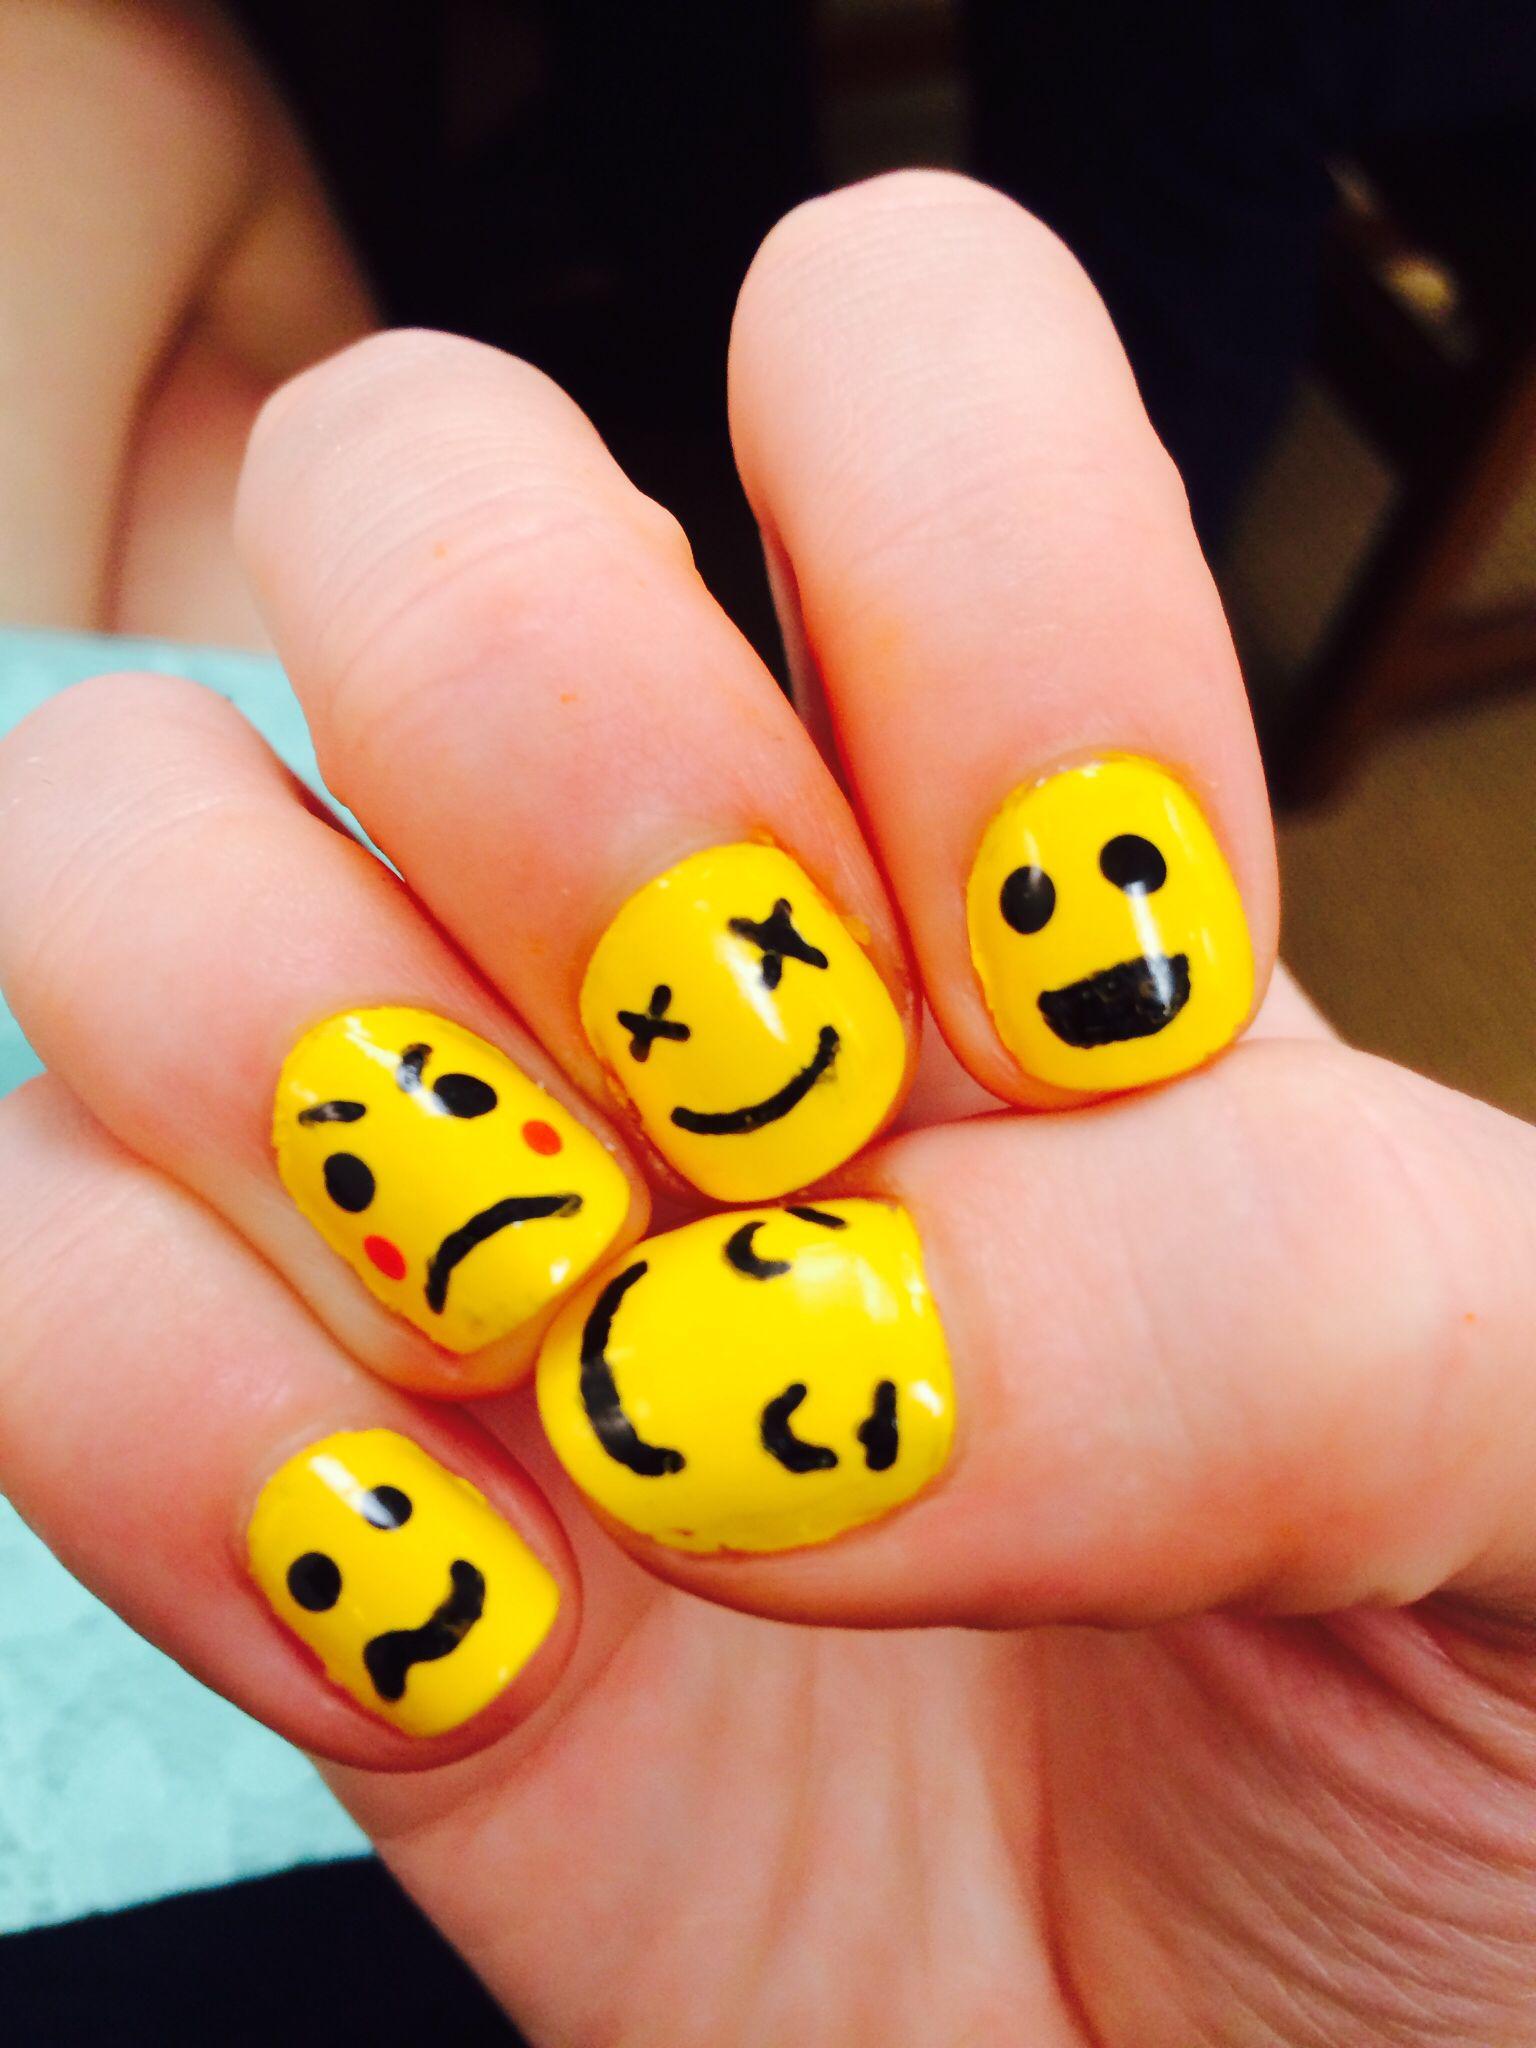 Emoji nail art the other hand - Emoji Nail Art The Other Hand My Magical Nail Art Uñas